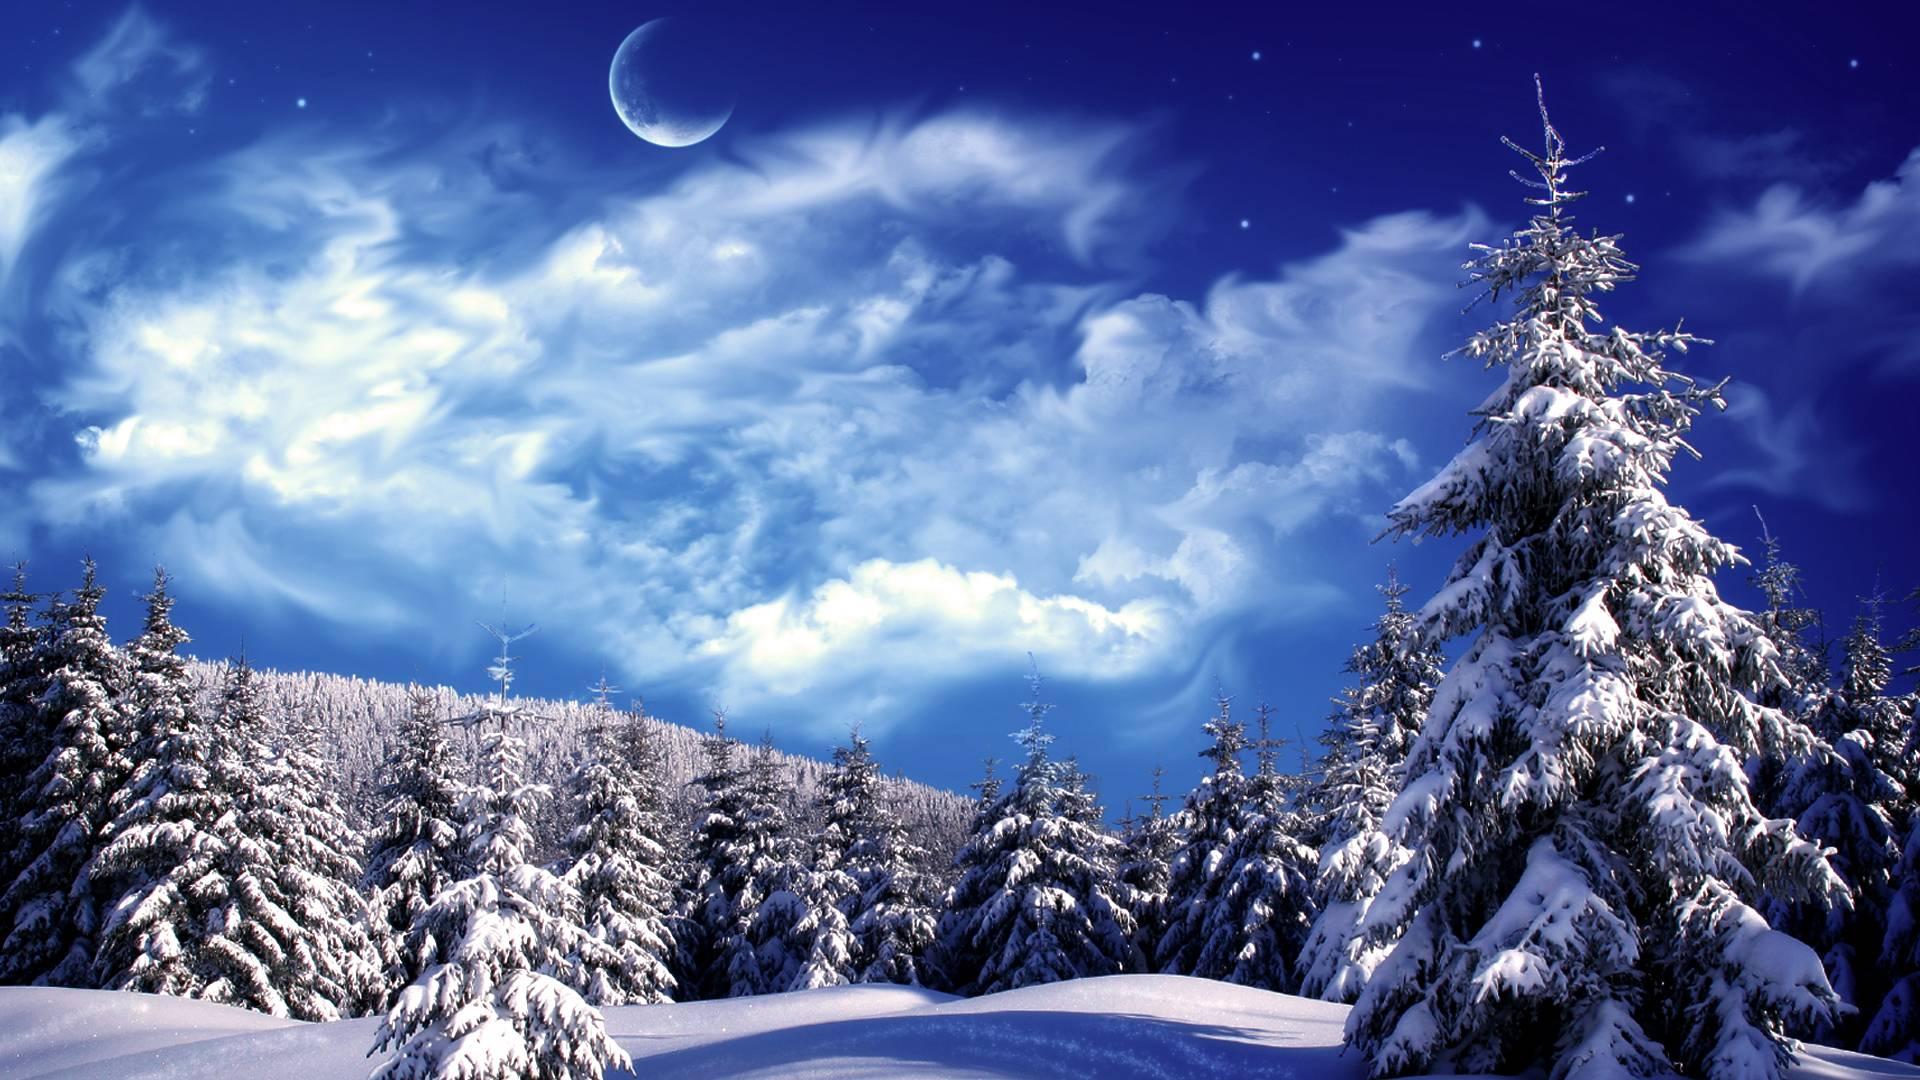 Winter Wonderland Desktop Backgrounds